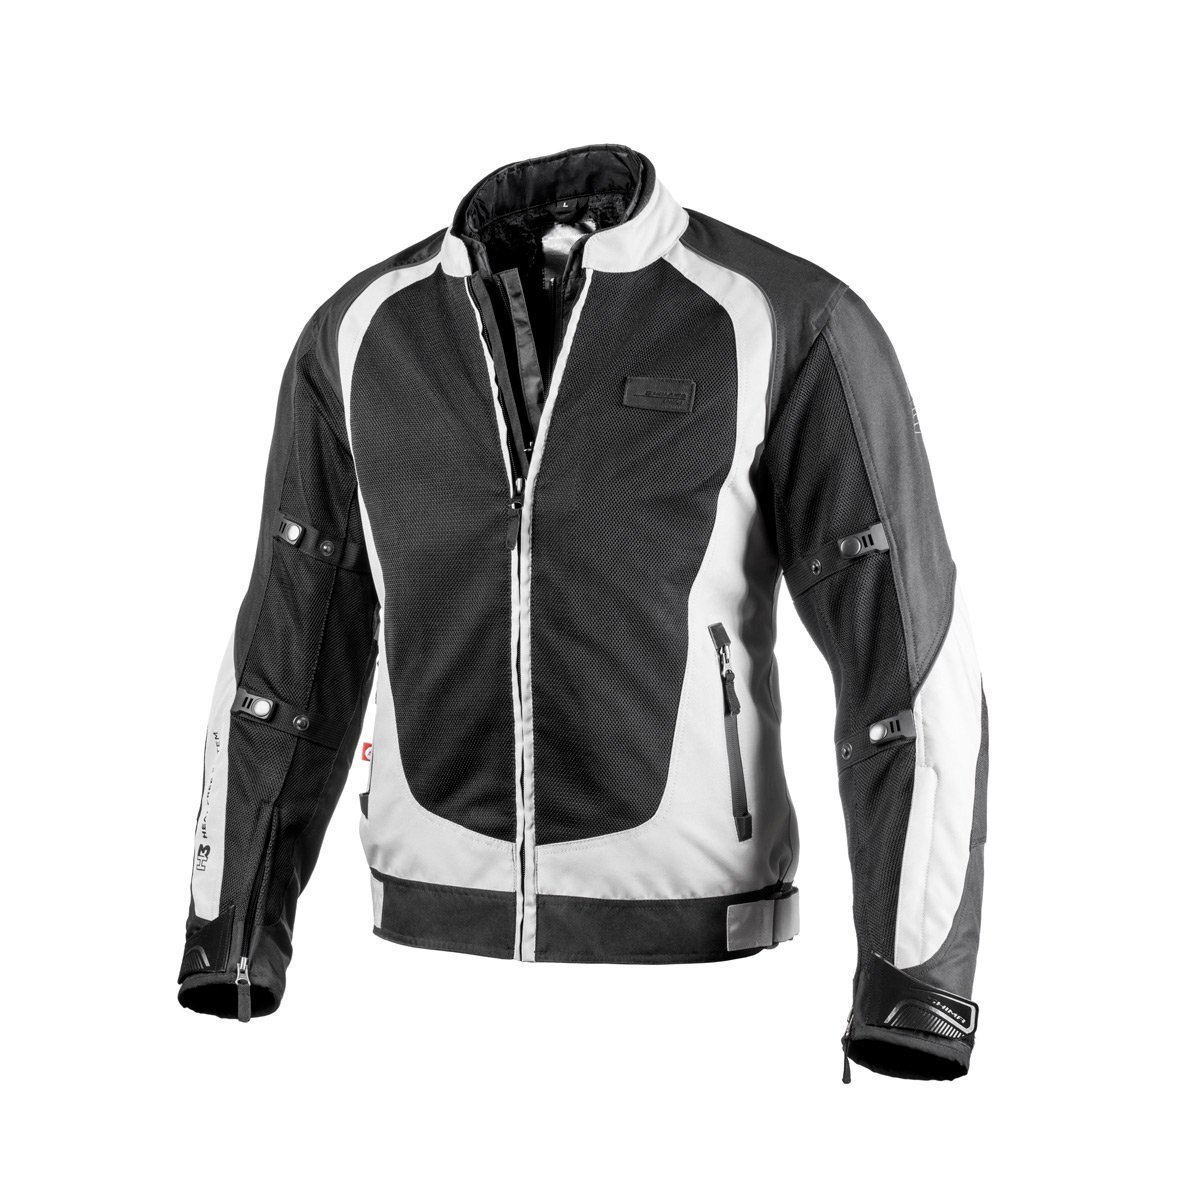 Shima X-MESH GREY, Sport Protective Summer Comfort Stylish Reflective Motorbike Jacket (S-XXL), Grey, Size:M